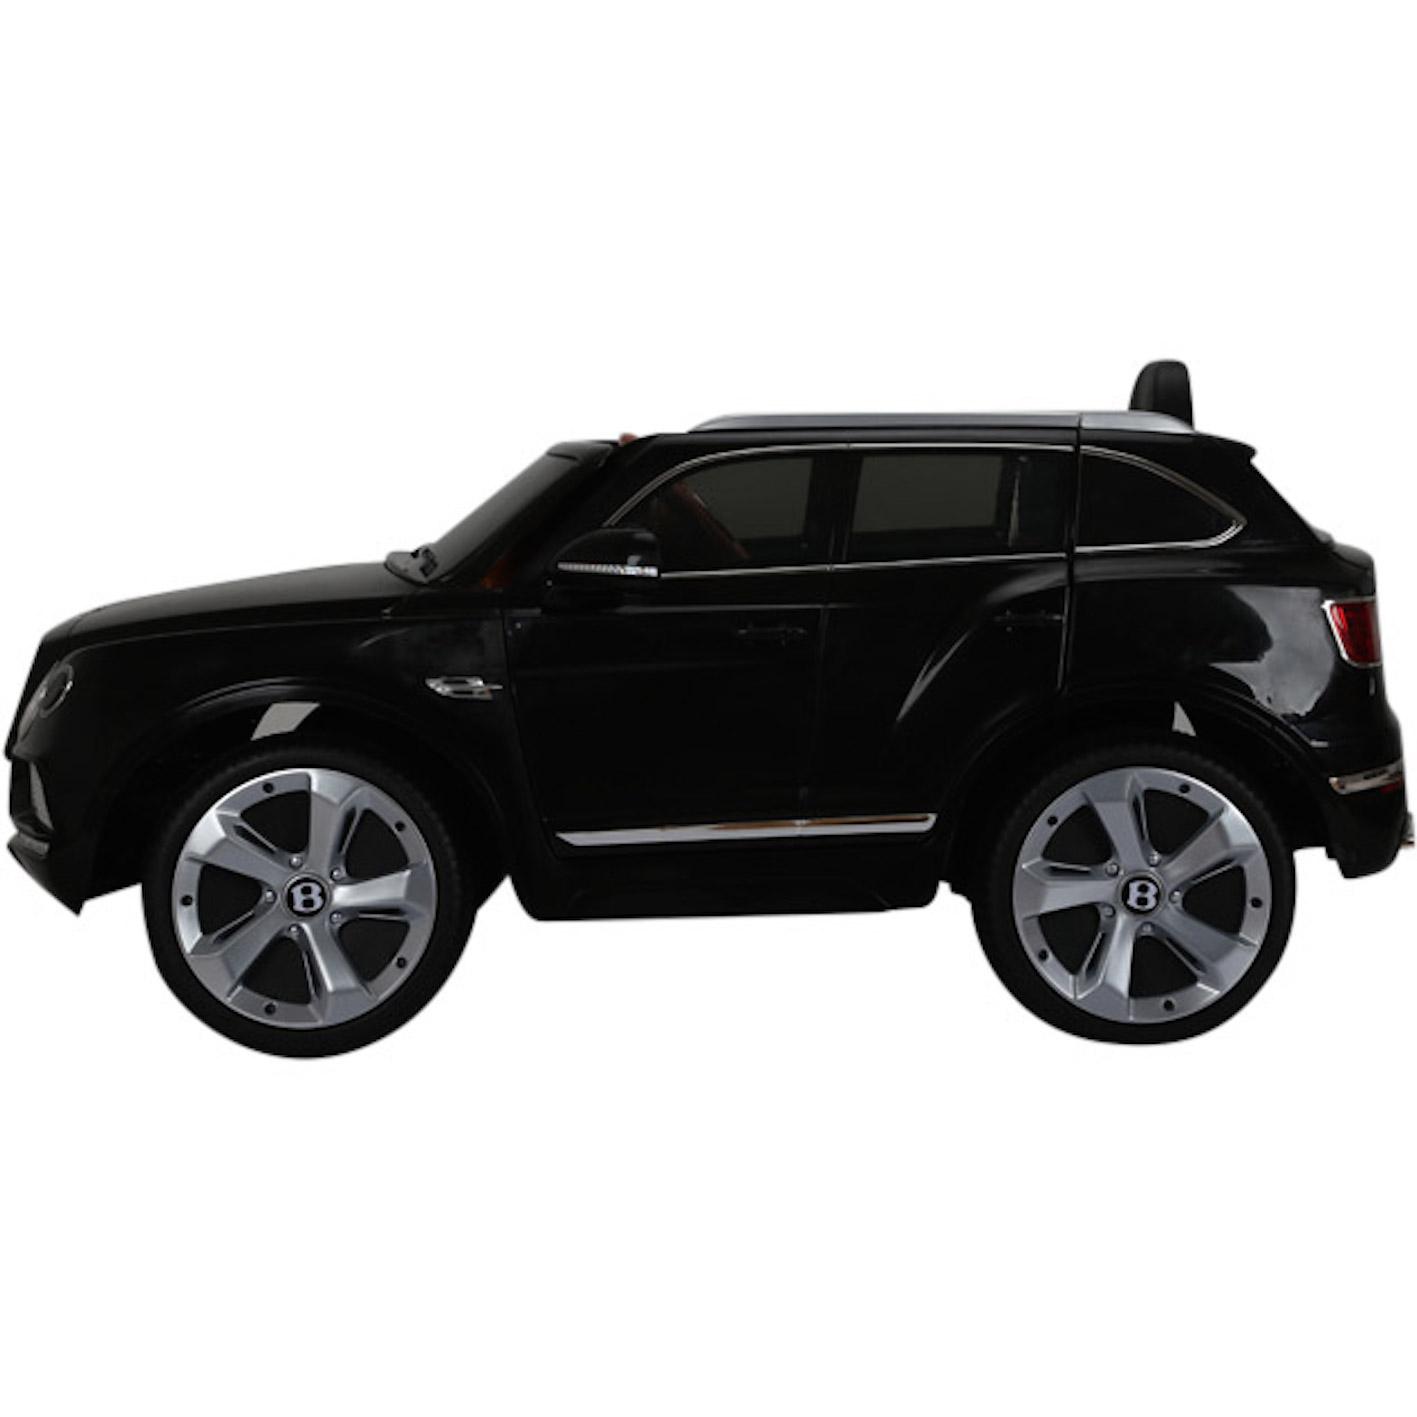 Licensed Bentley Bentayga 12V Children's Electric Ride On